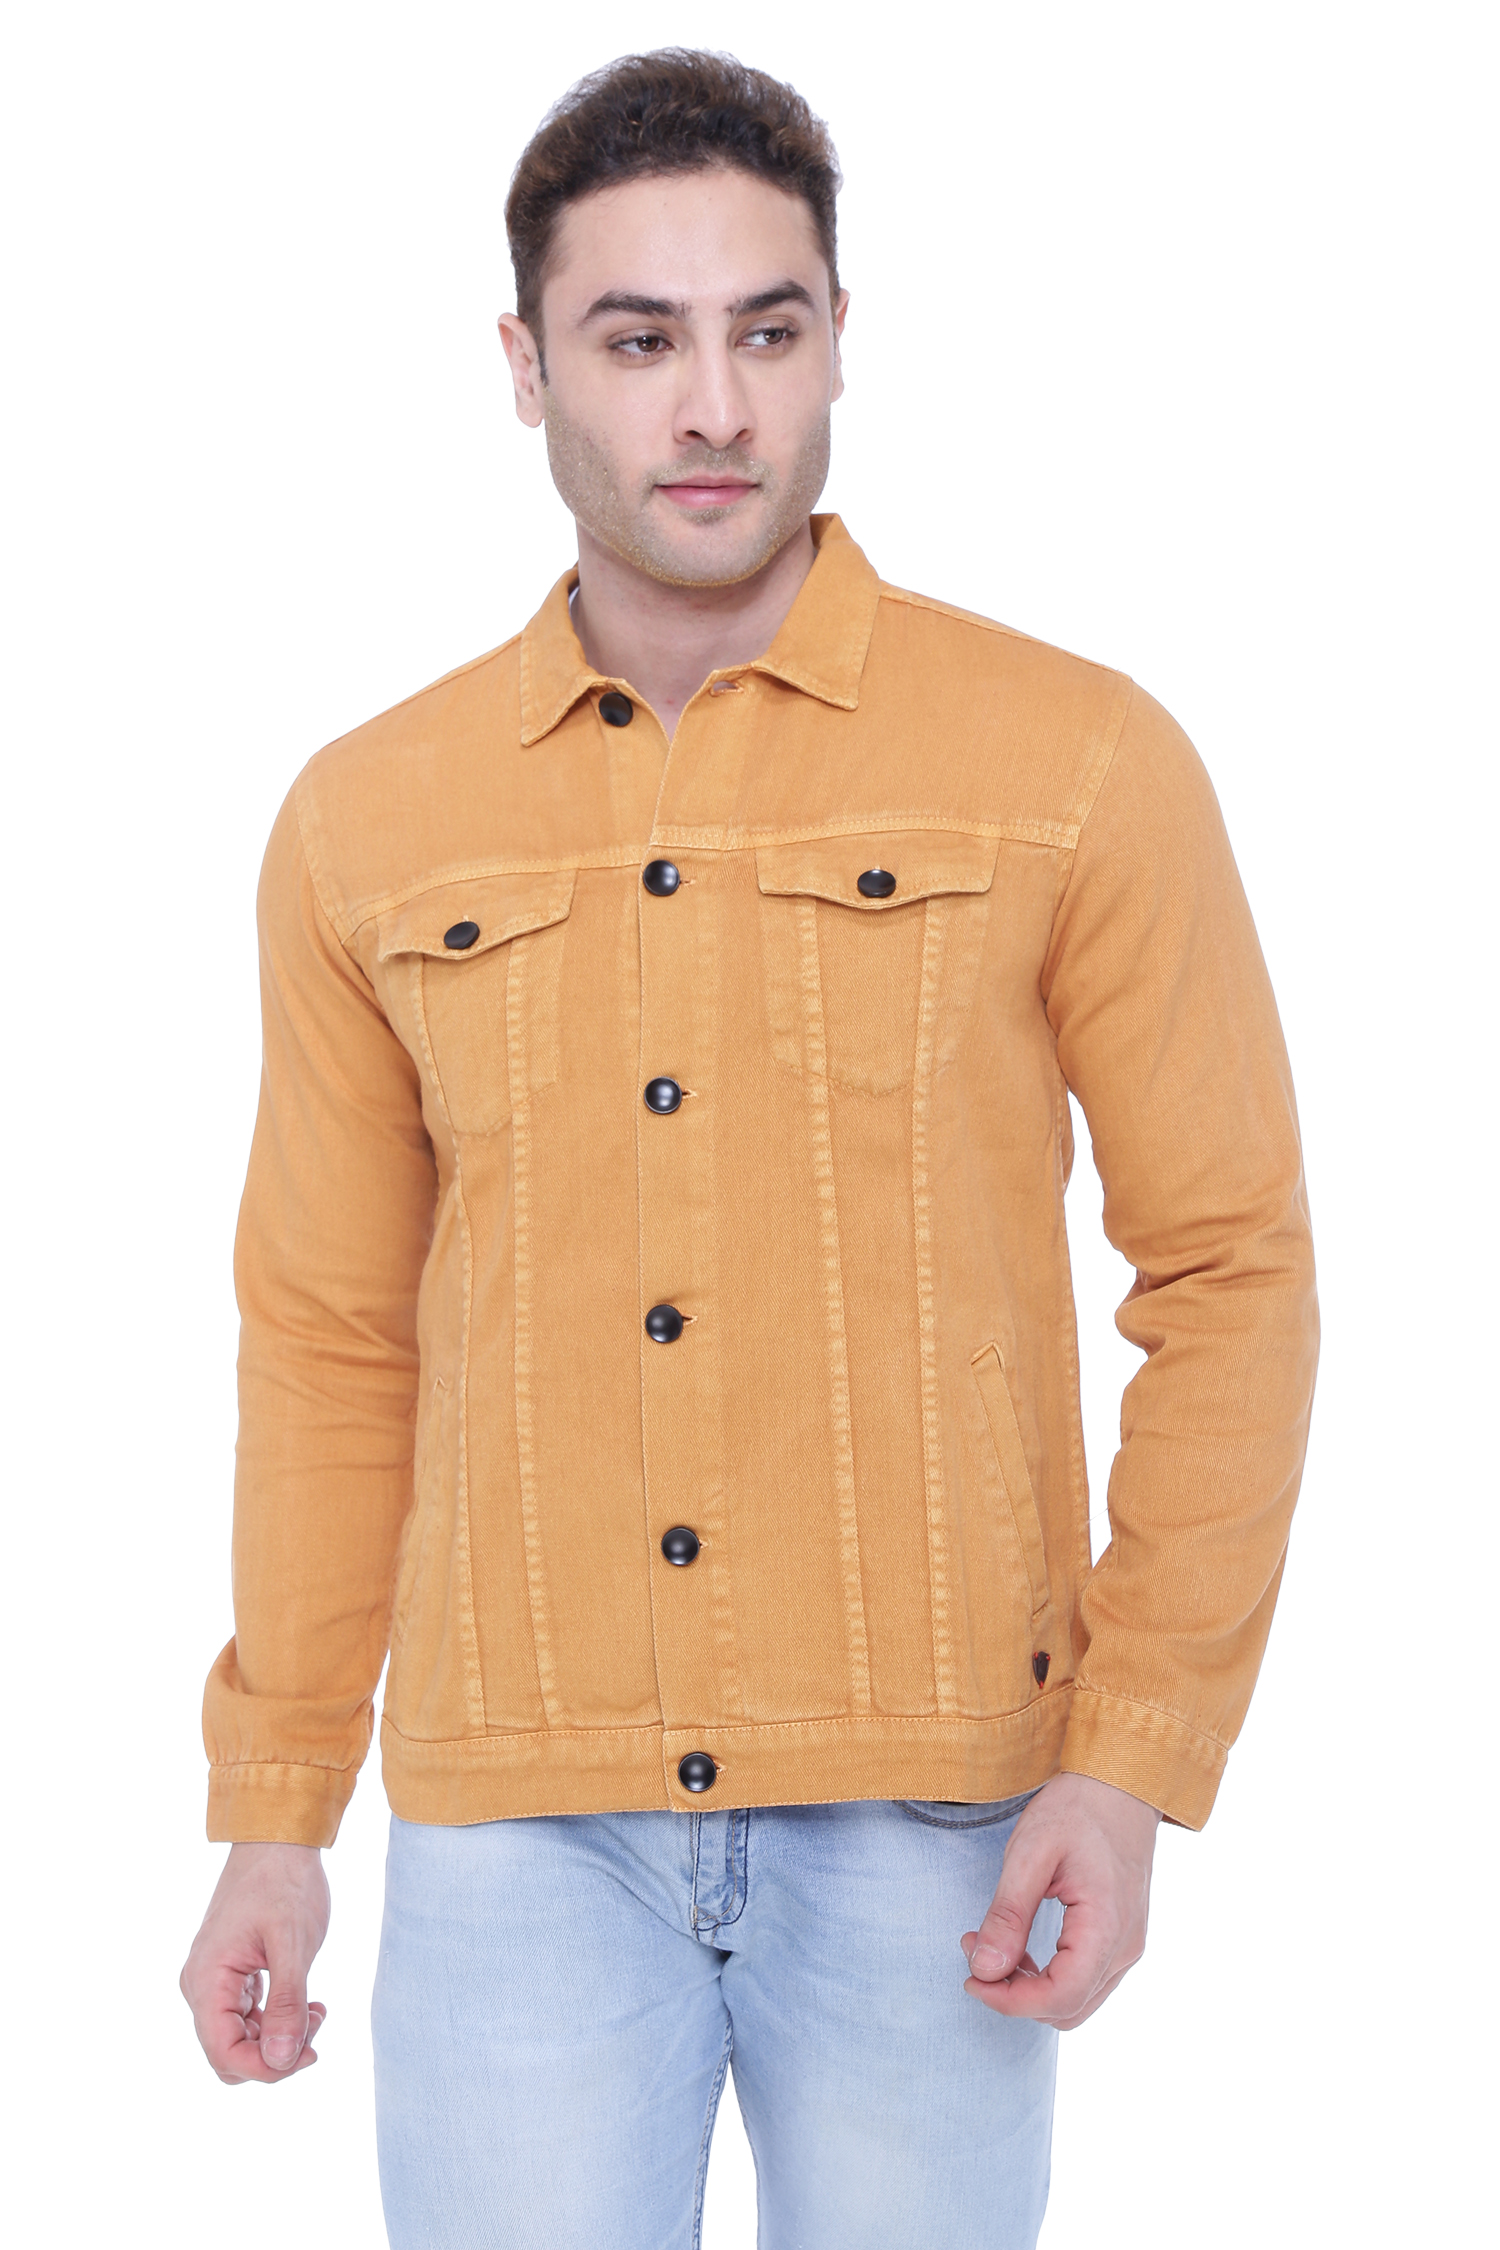 Kuons Avenue | Kuons Avenue Men's Mustard Denim Jacket- KACLFS1363YL